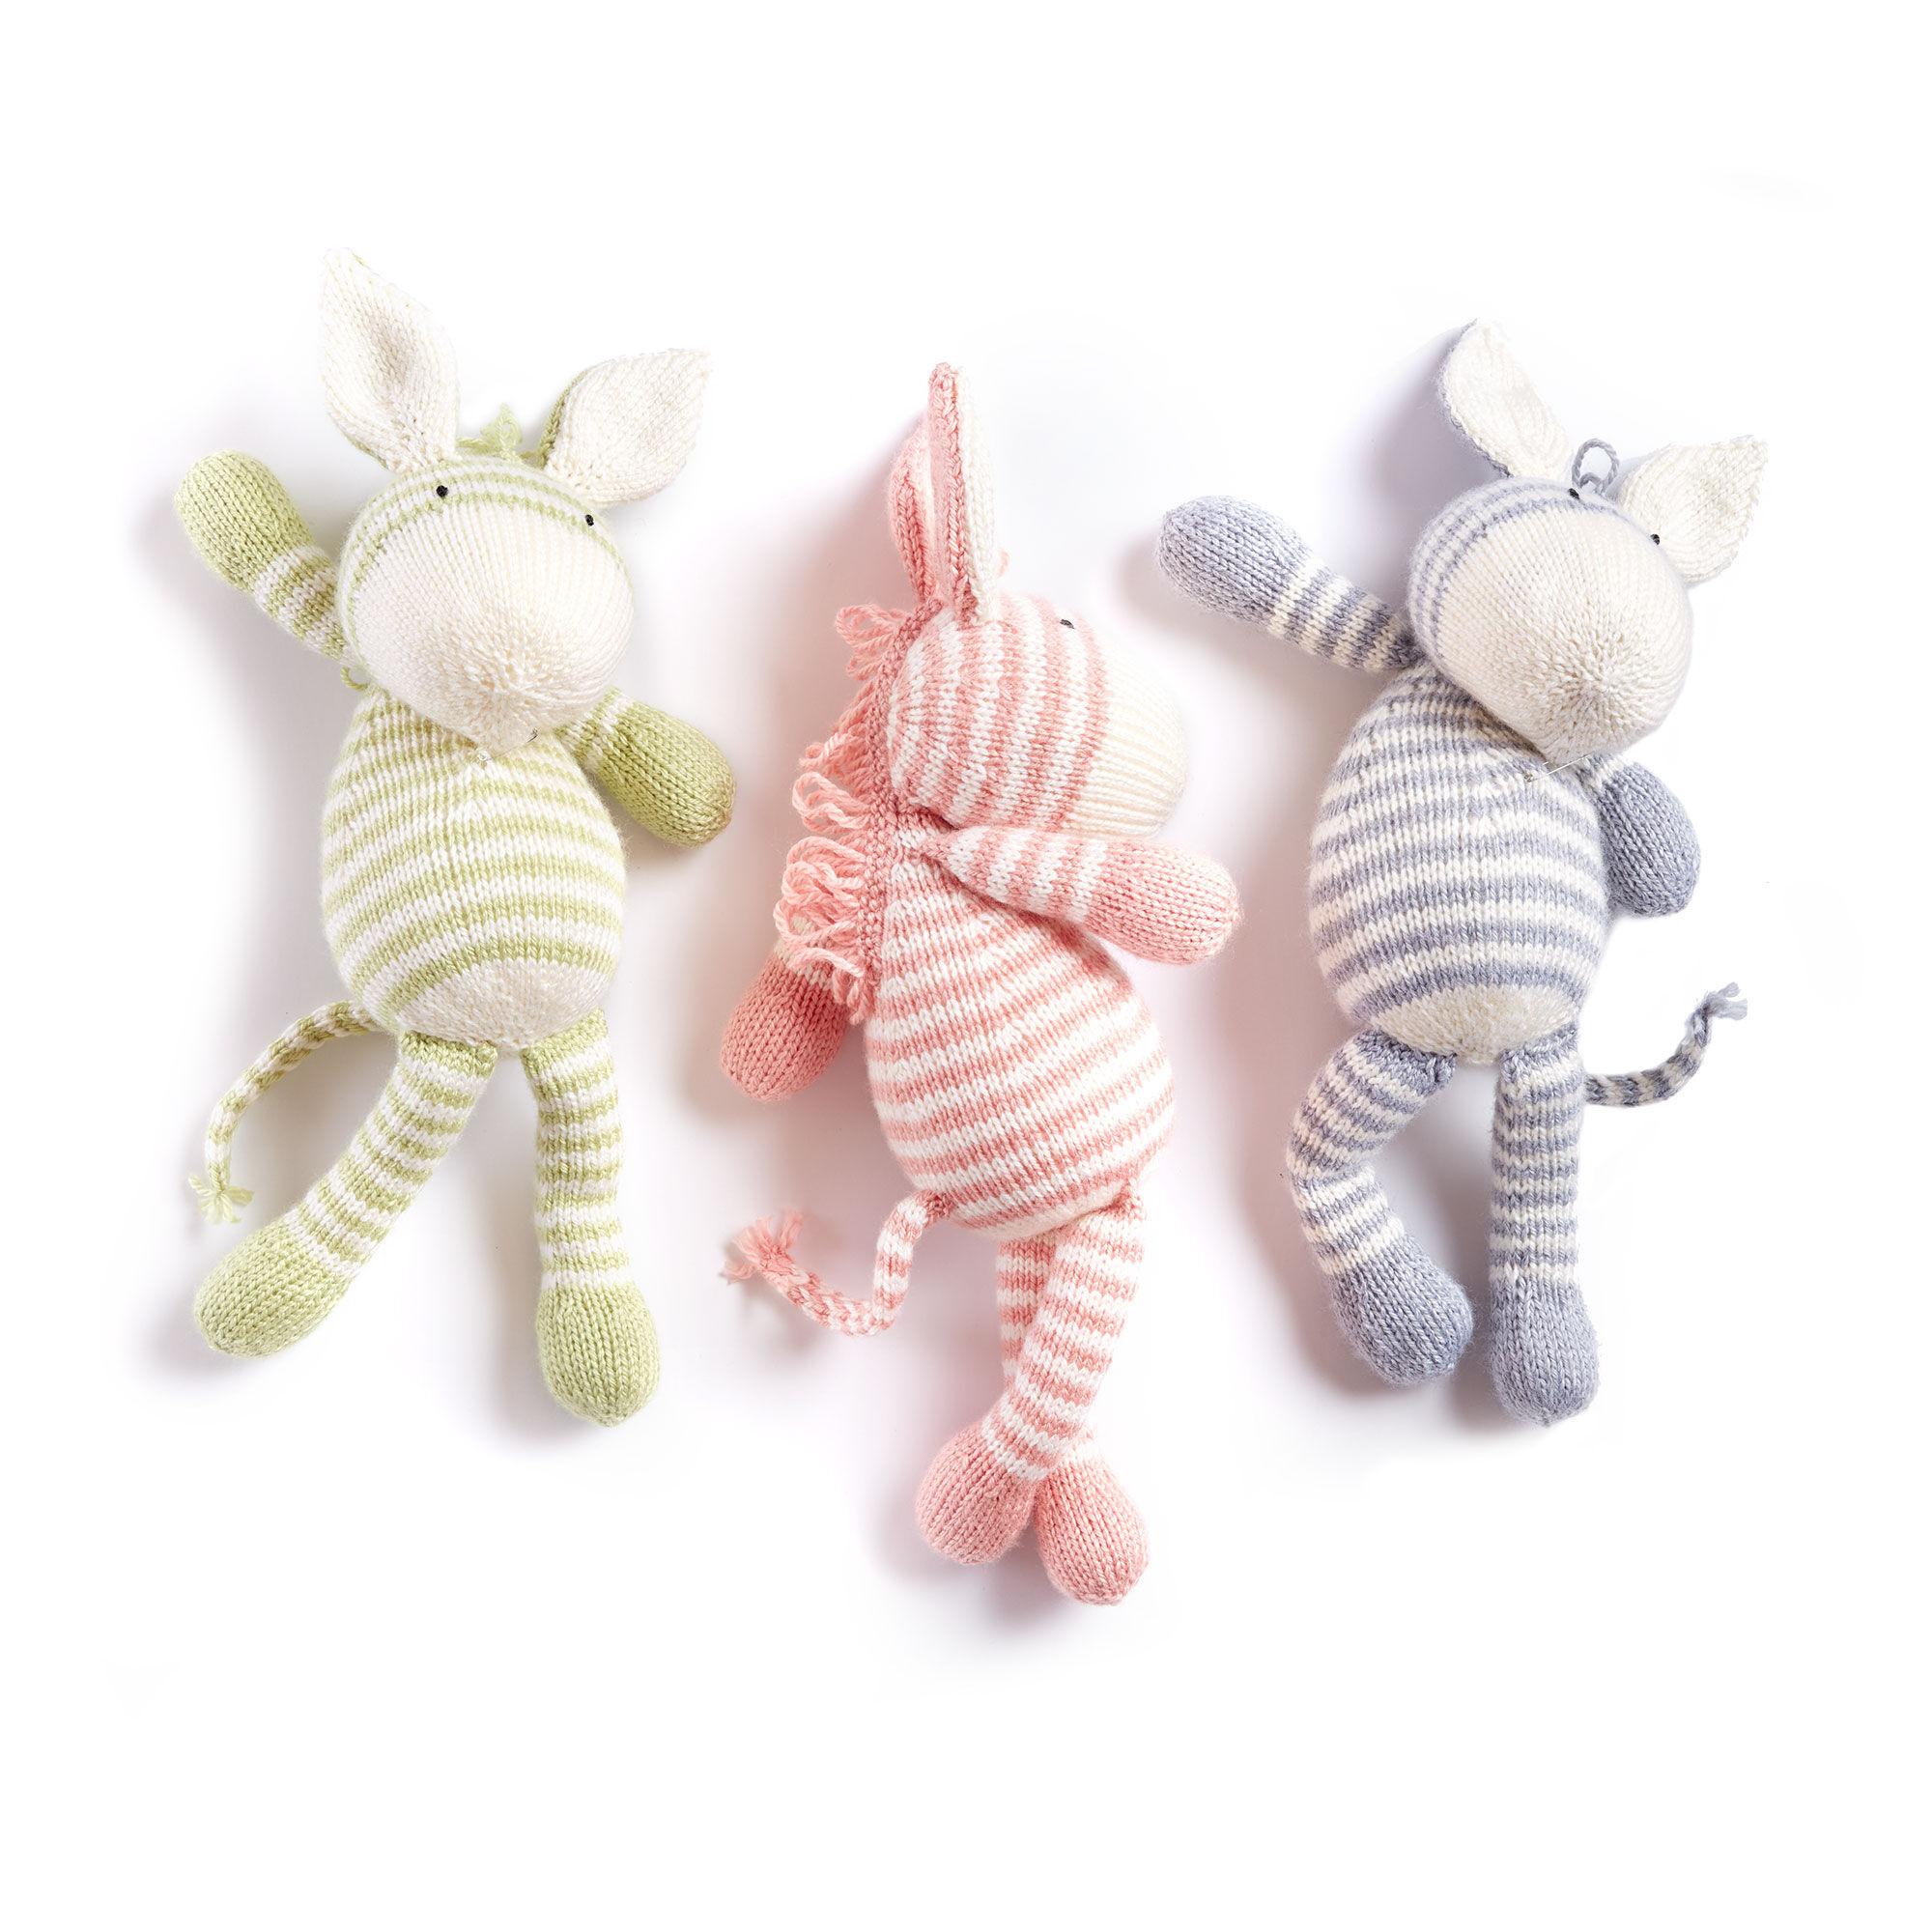 Bernat Knit Zebra, Soft Fern | Yarnspirations